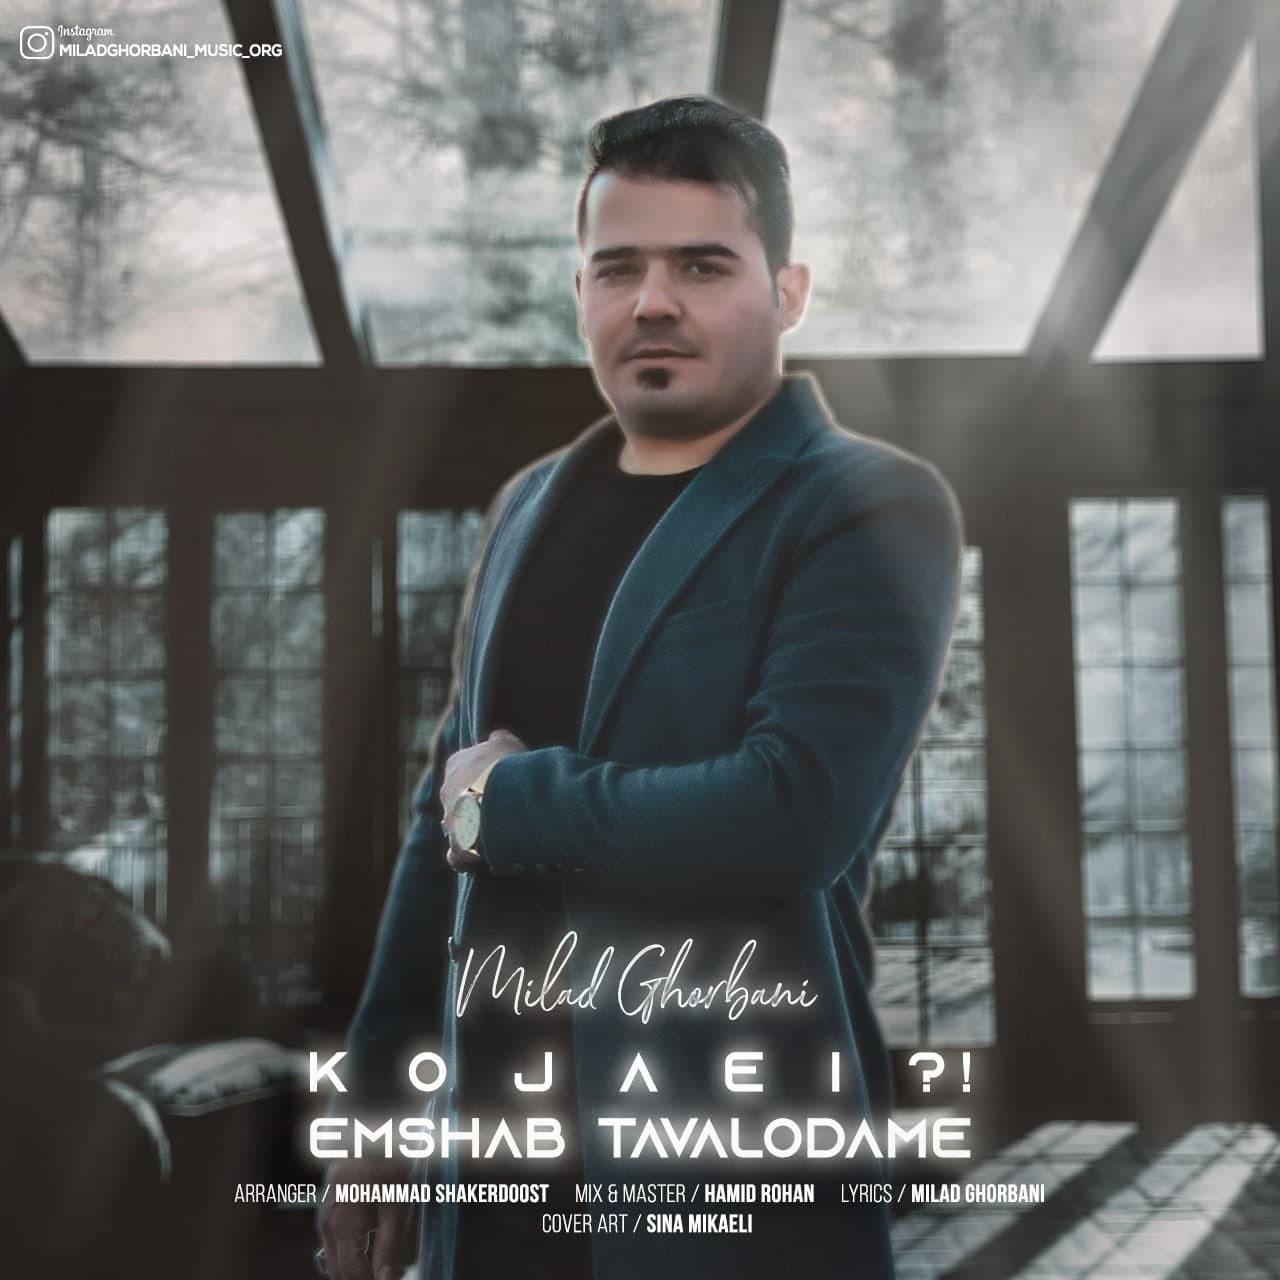 Milad Ghorbani – Kojaei Emshab Tavalodame